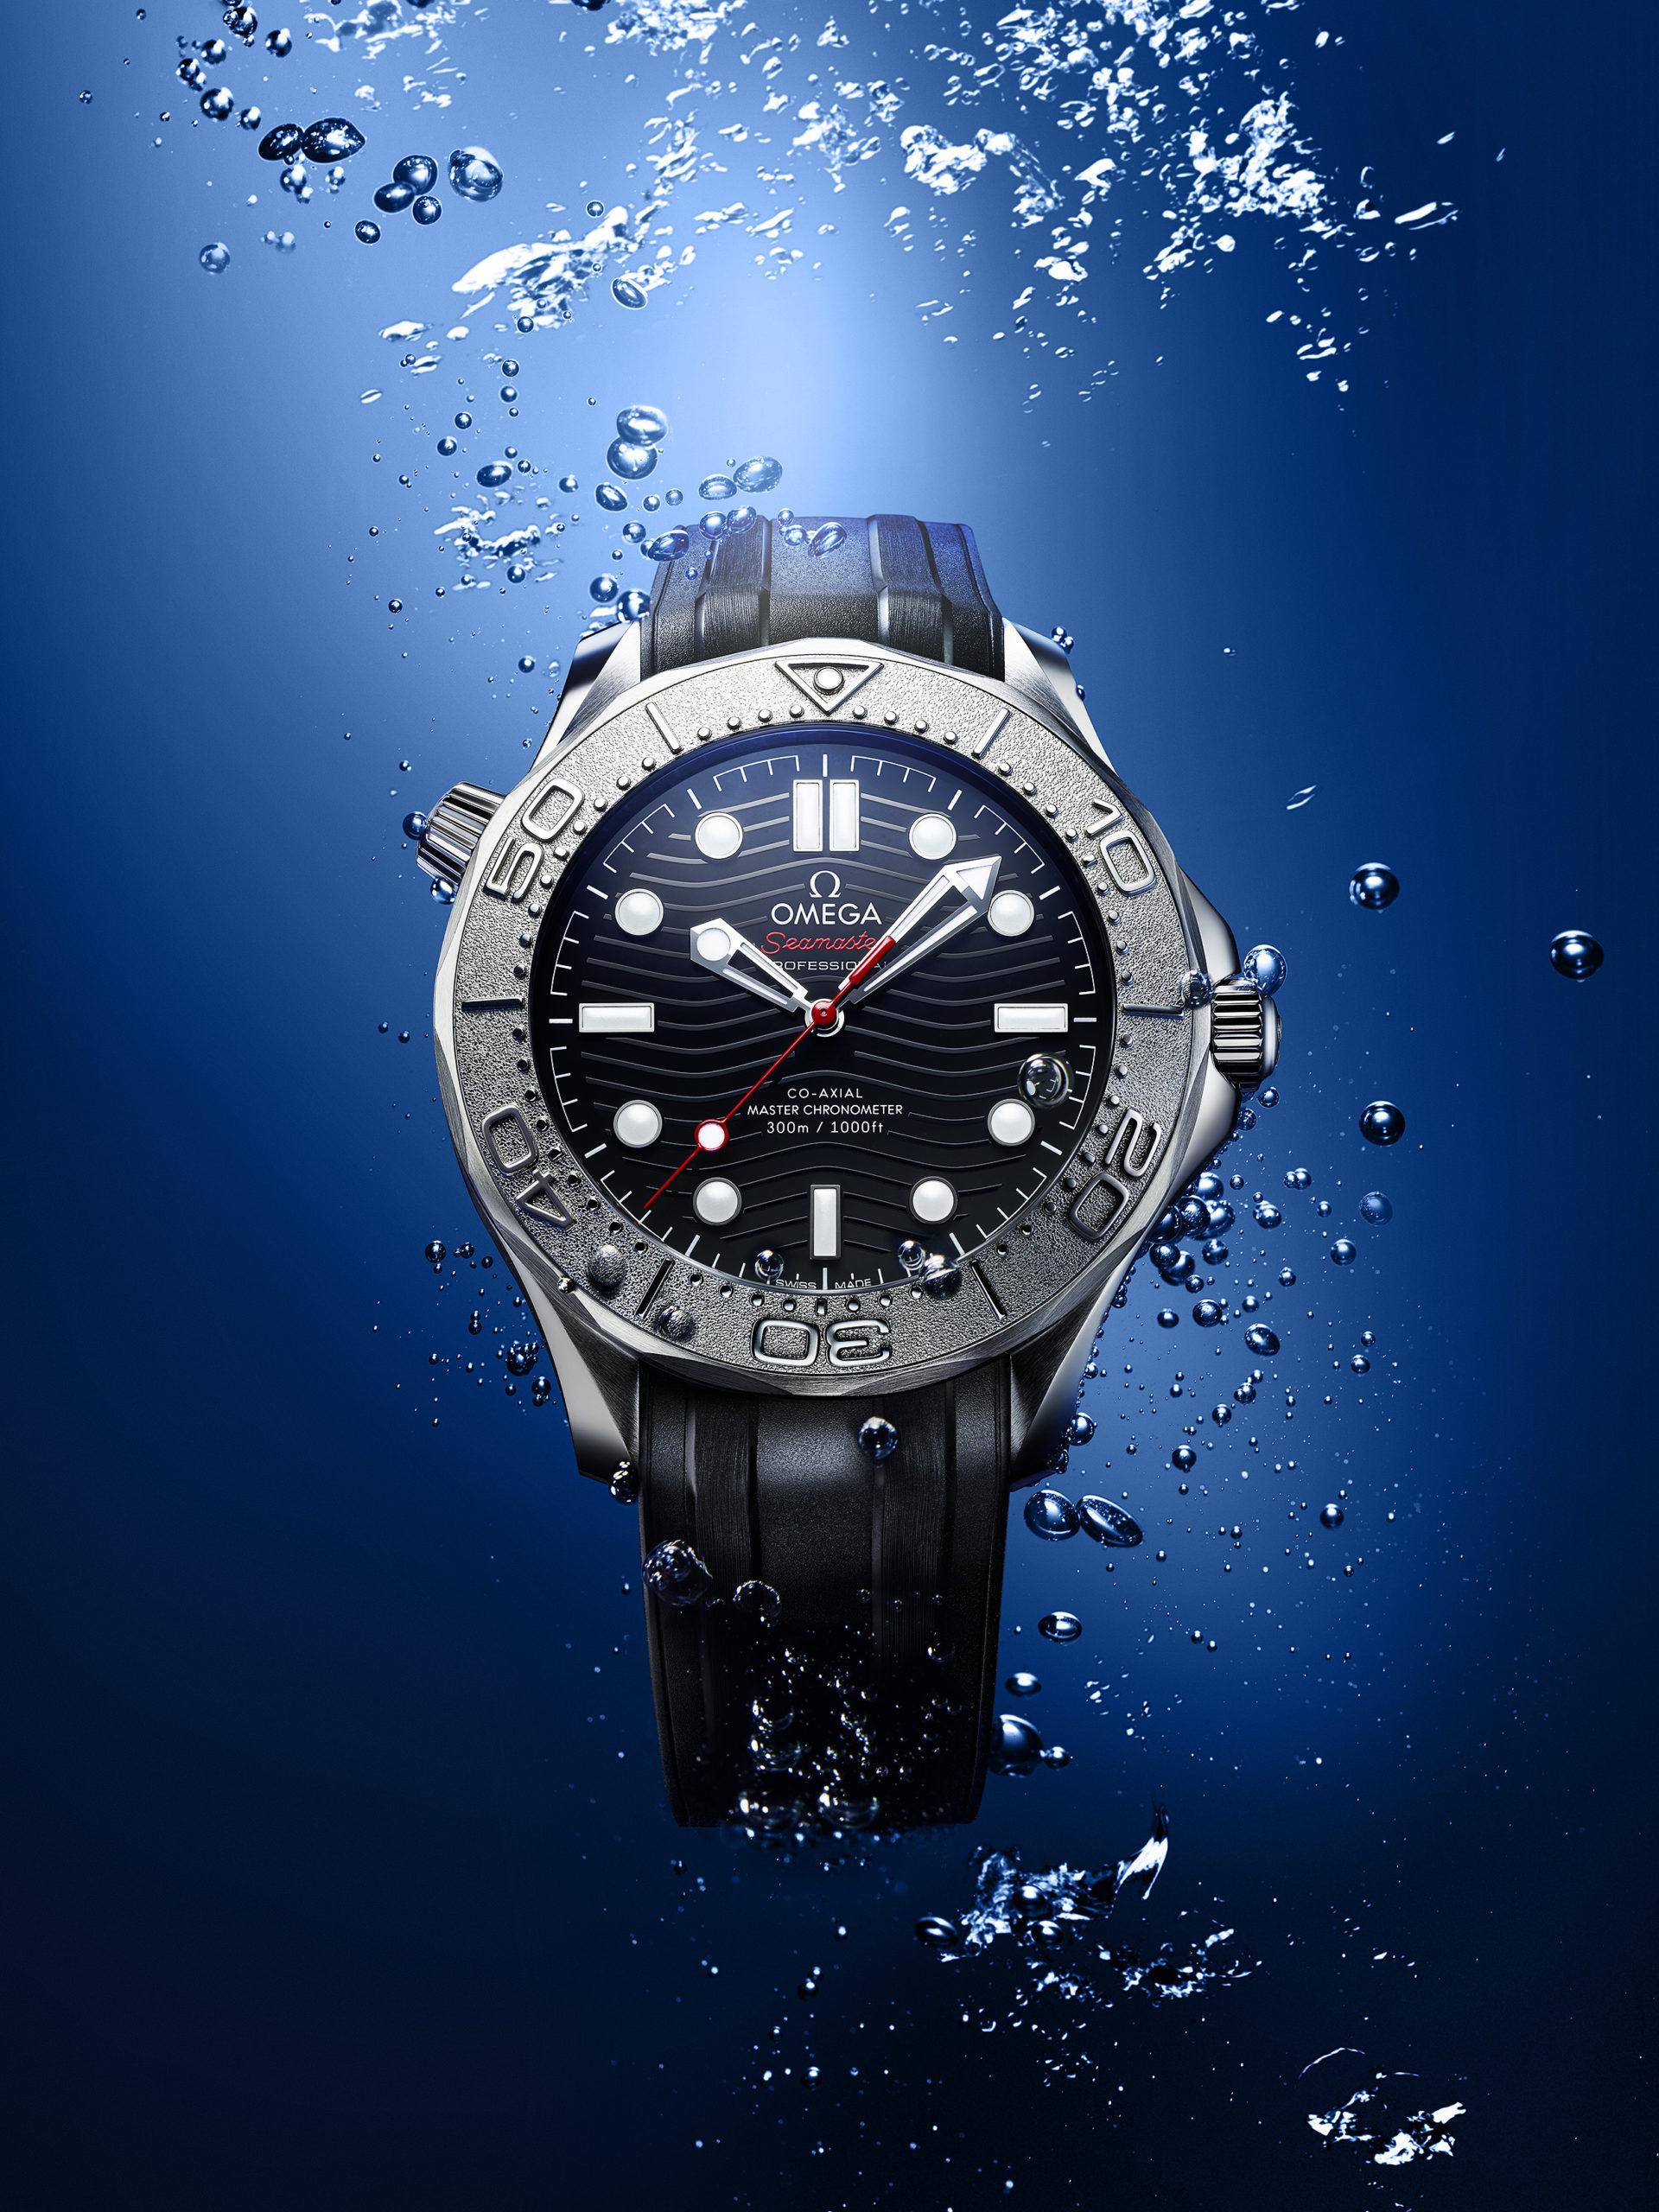 Omega Seamaster Diver 300M Nekton Edition front